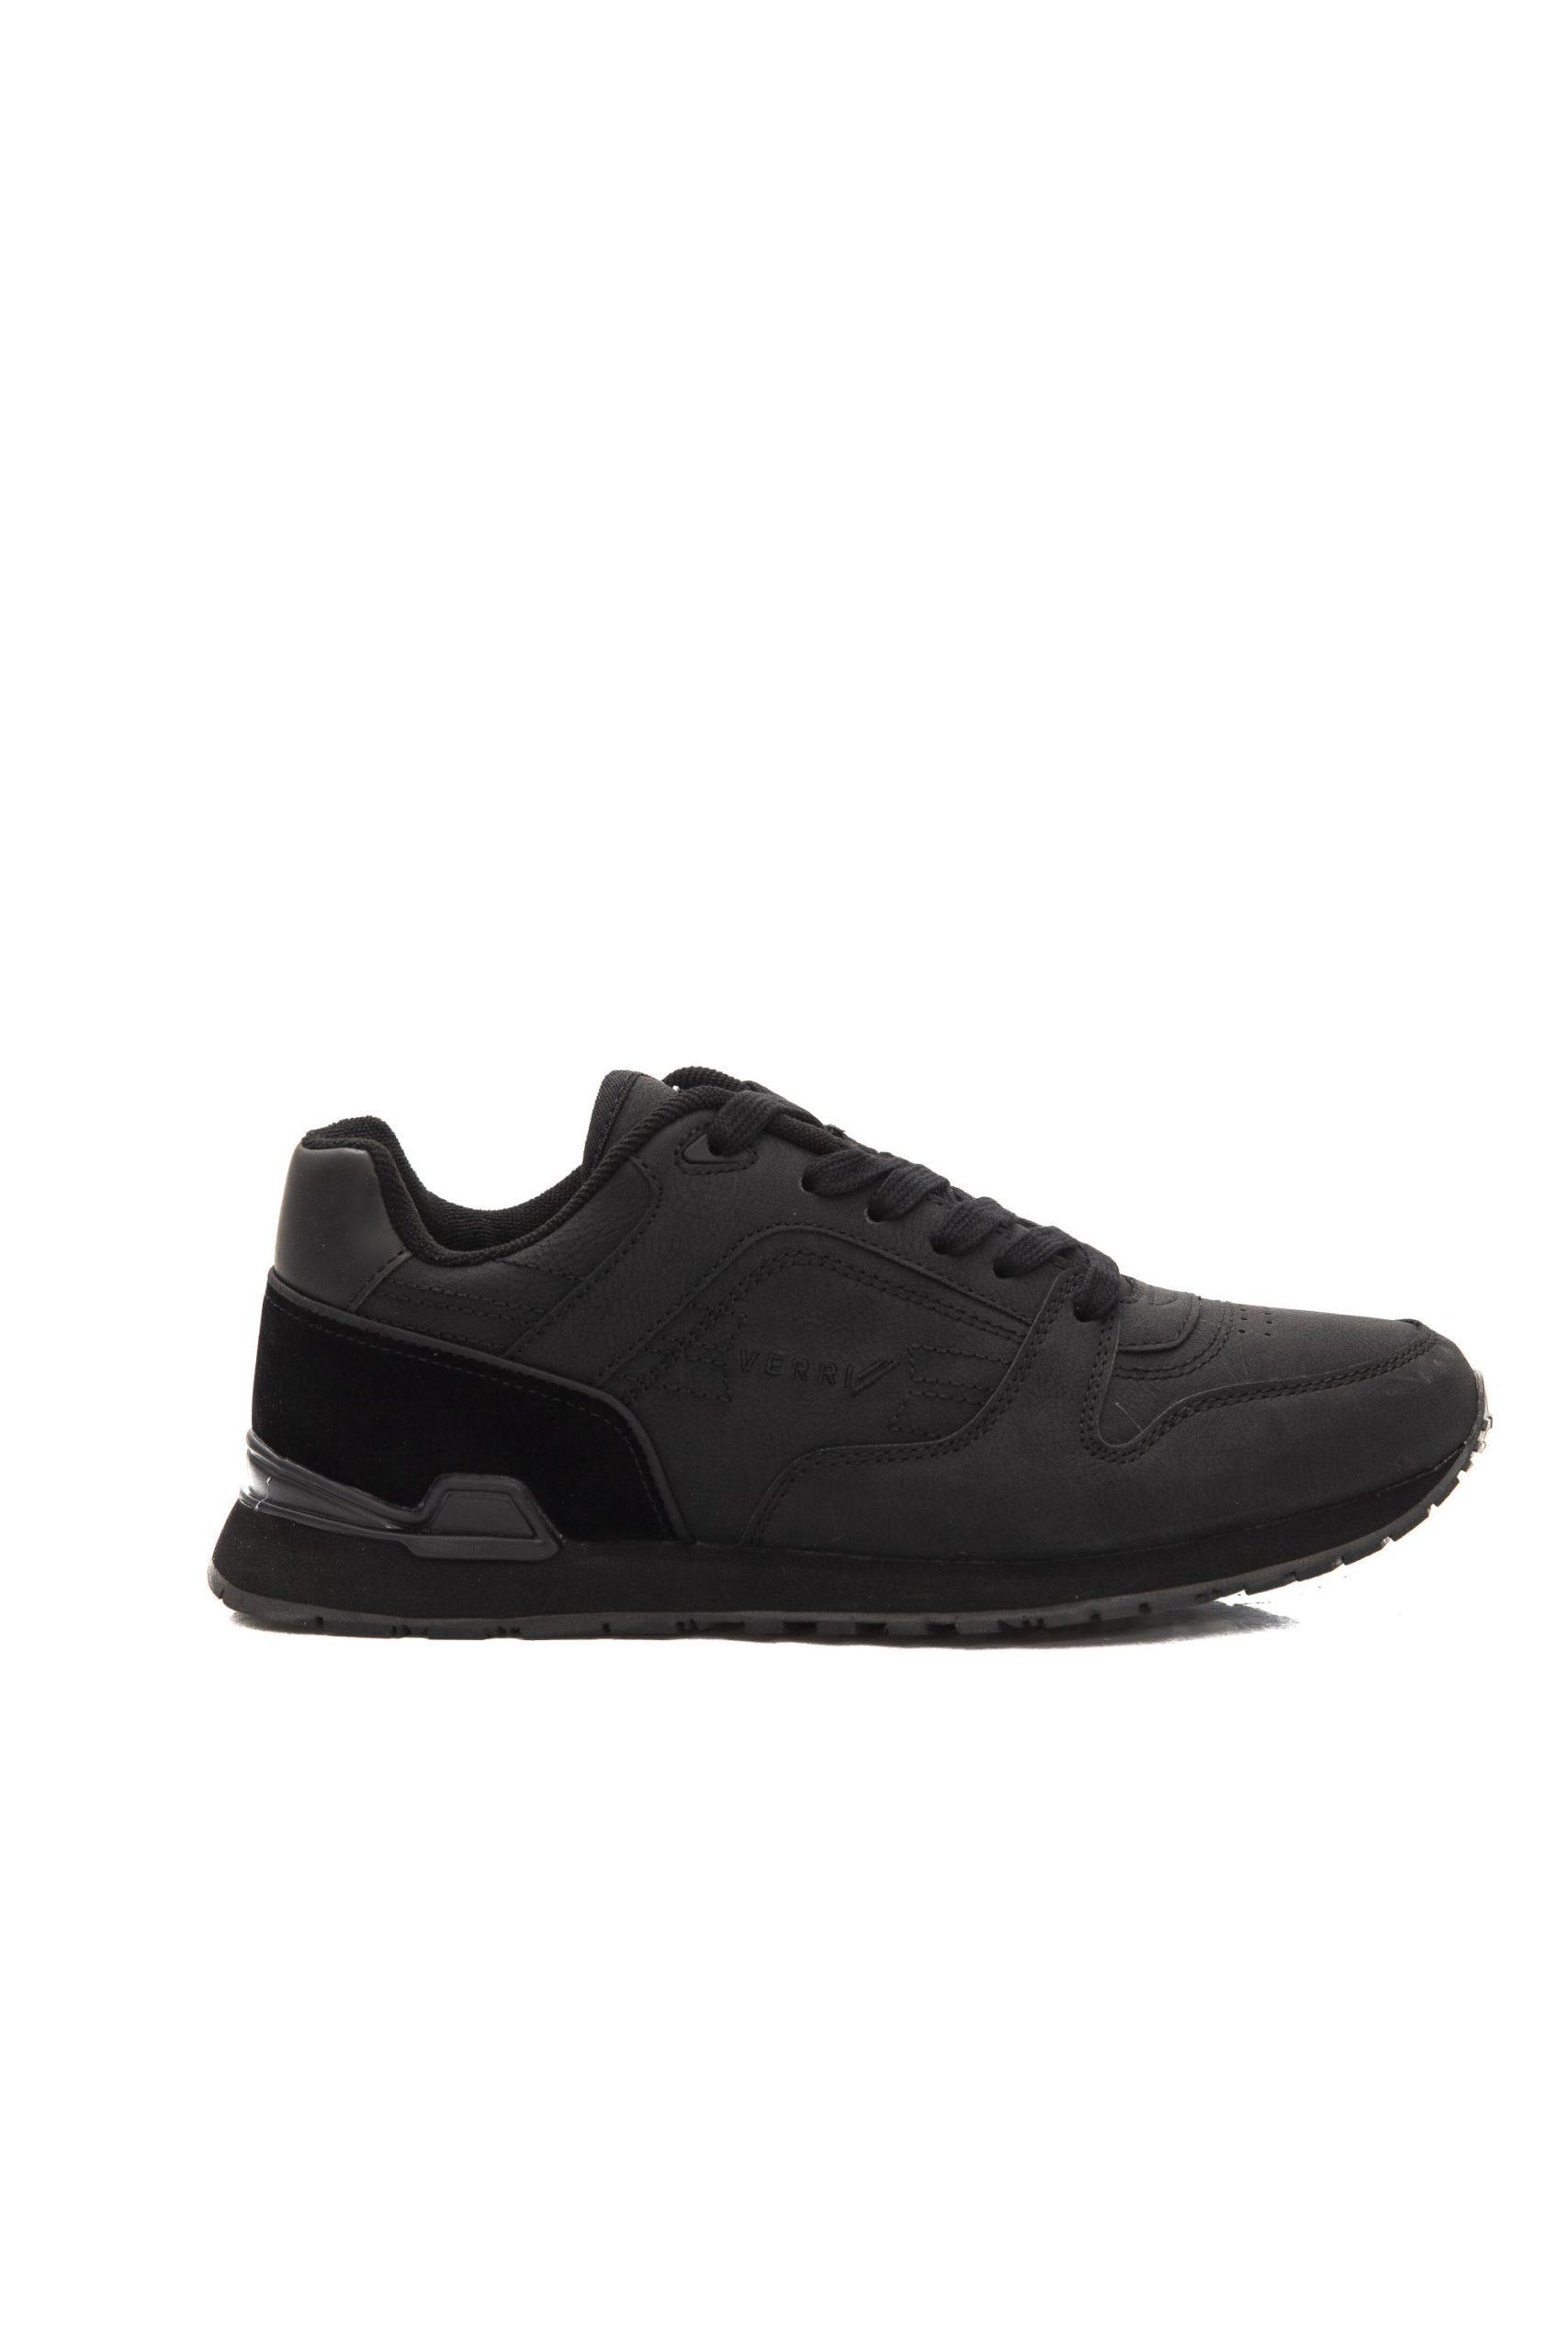 Verri Men's Trainers Black VE663798 - EU43/US10